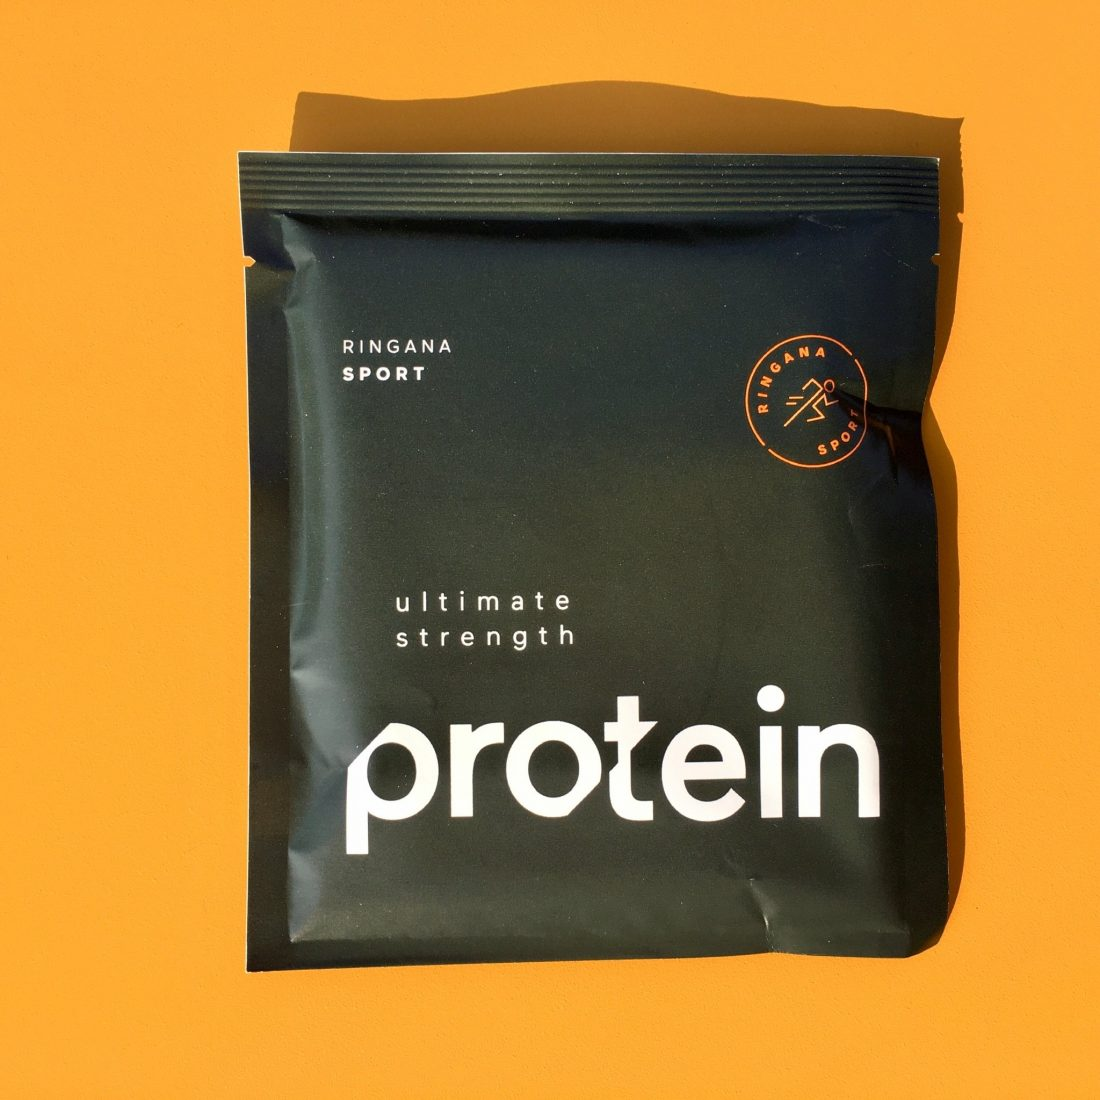 Ringana Protein